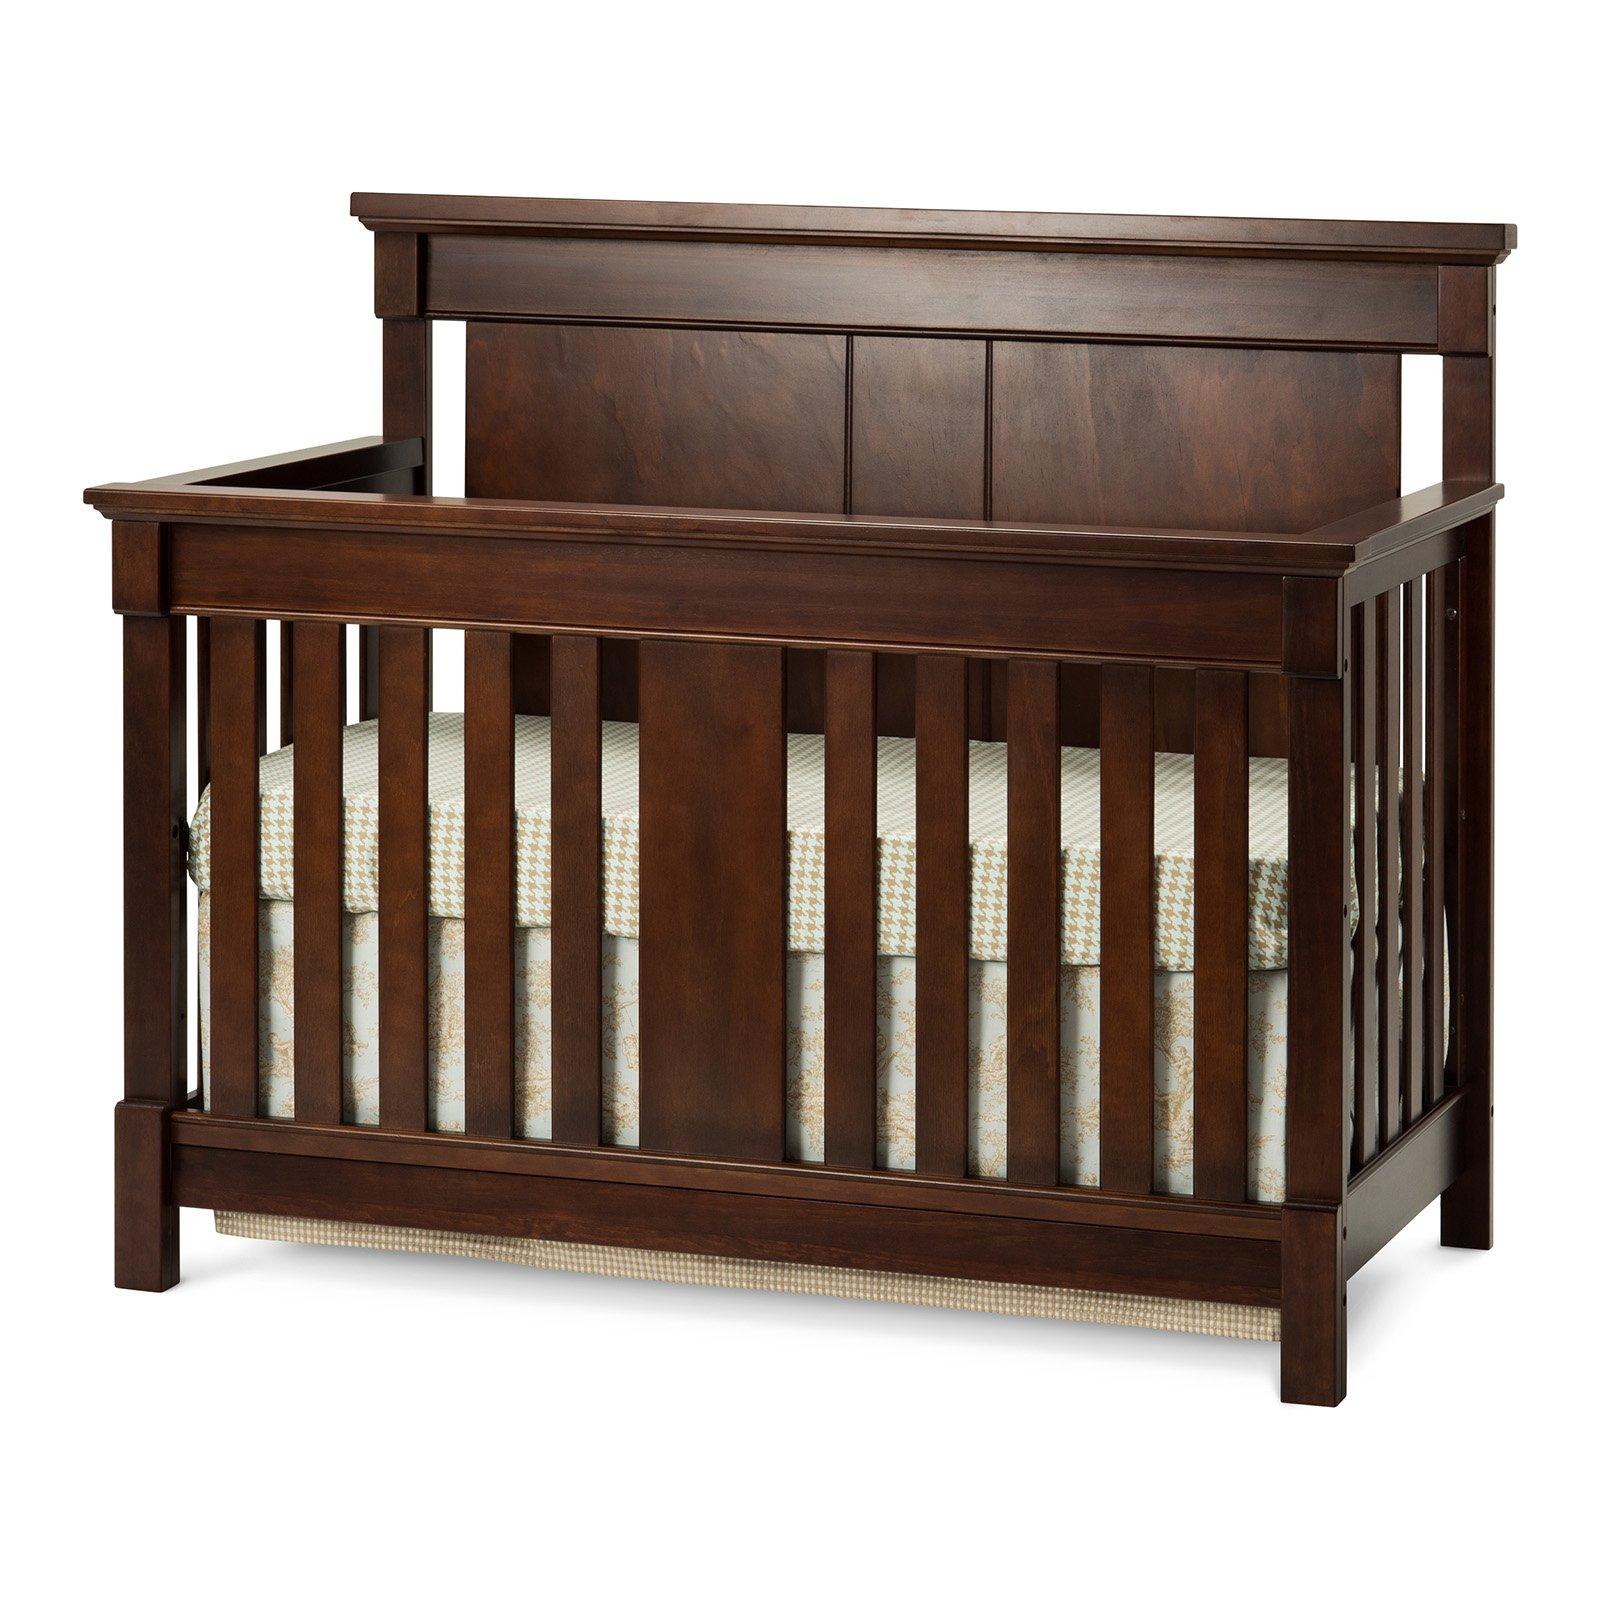 Crib Tent For Convertible Cribs Amp Davinci Sc 1 St 5 Star